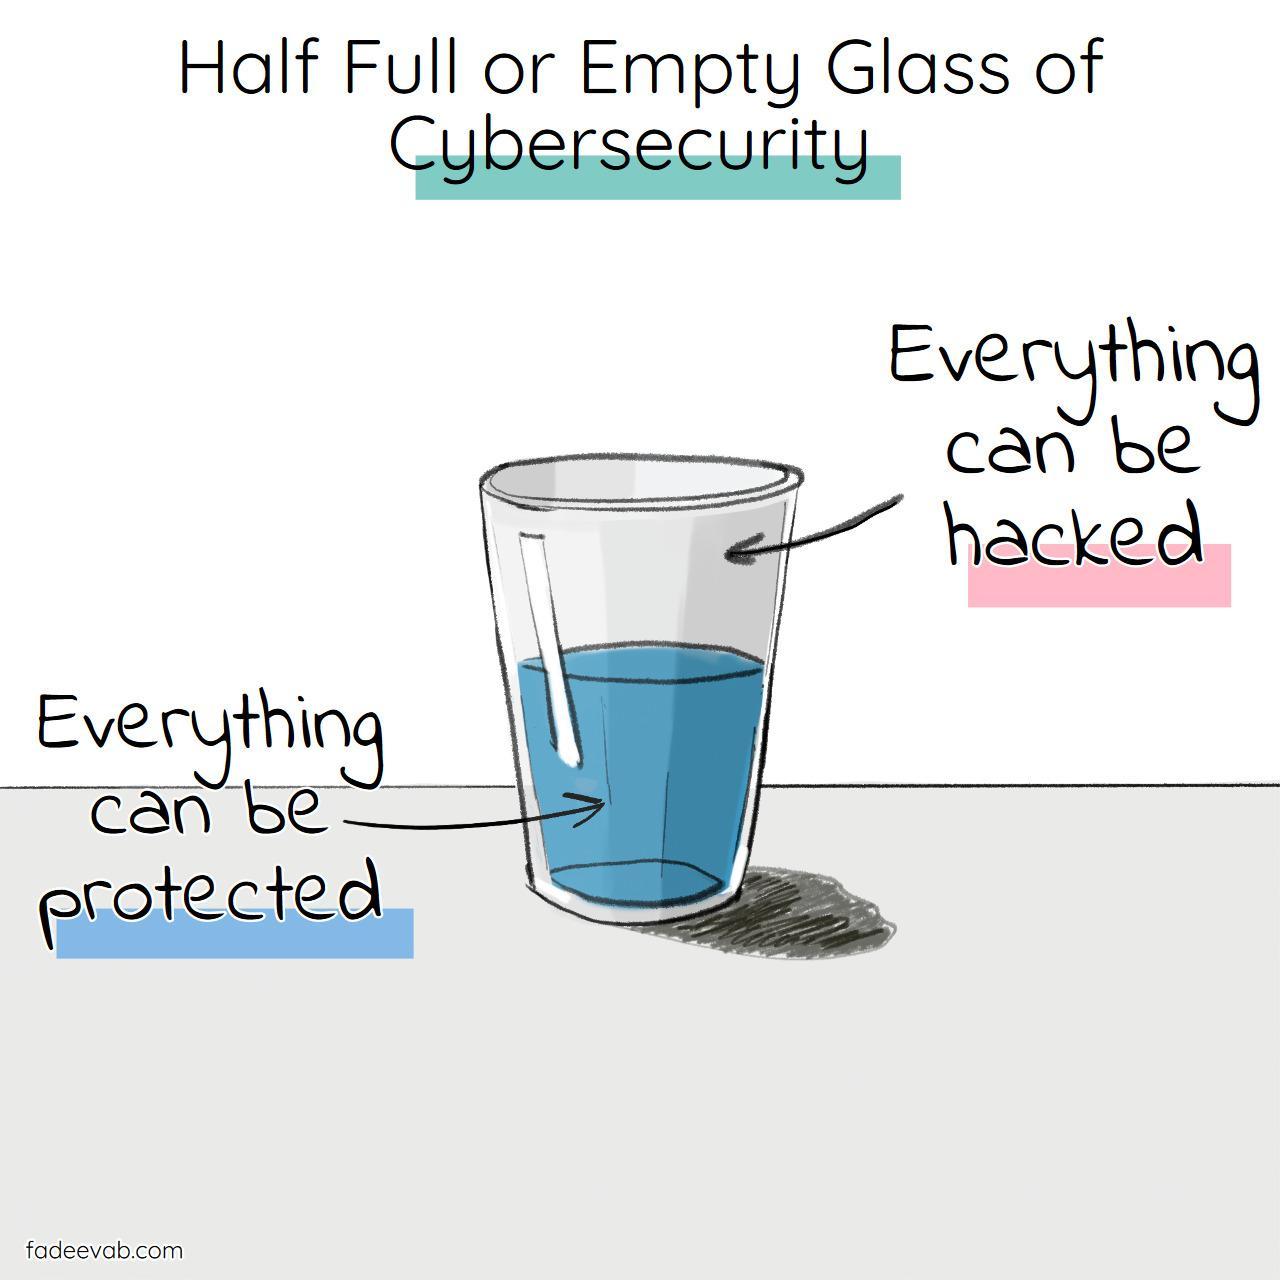 Half Full or Half Empty Glass of Cybersecurity